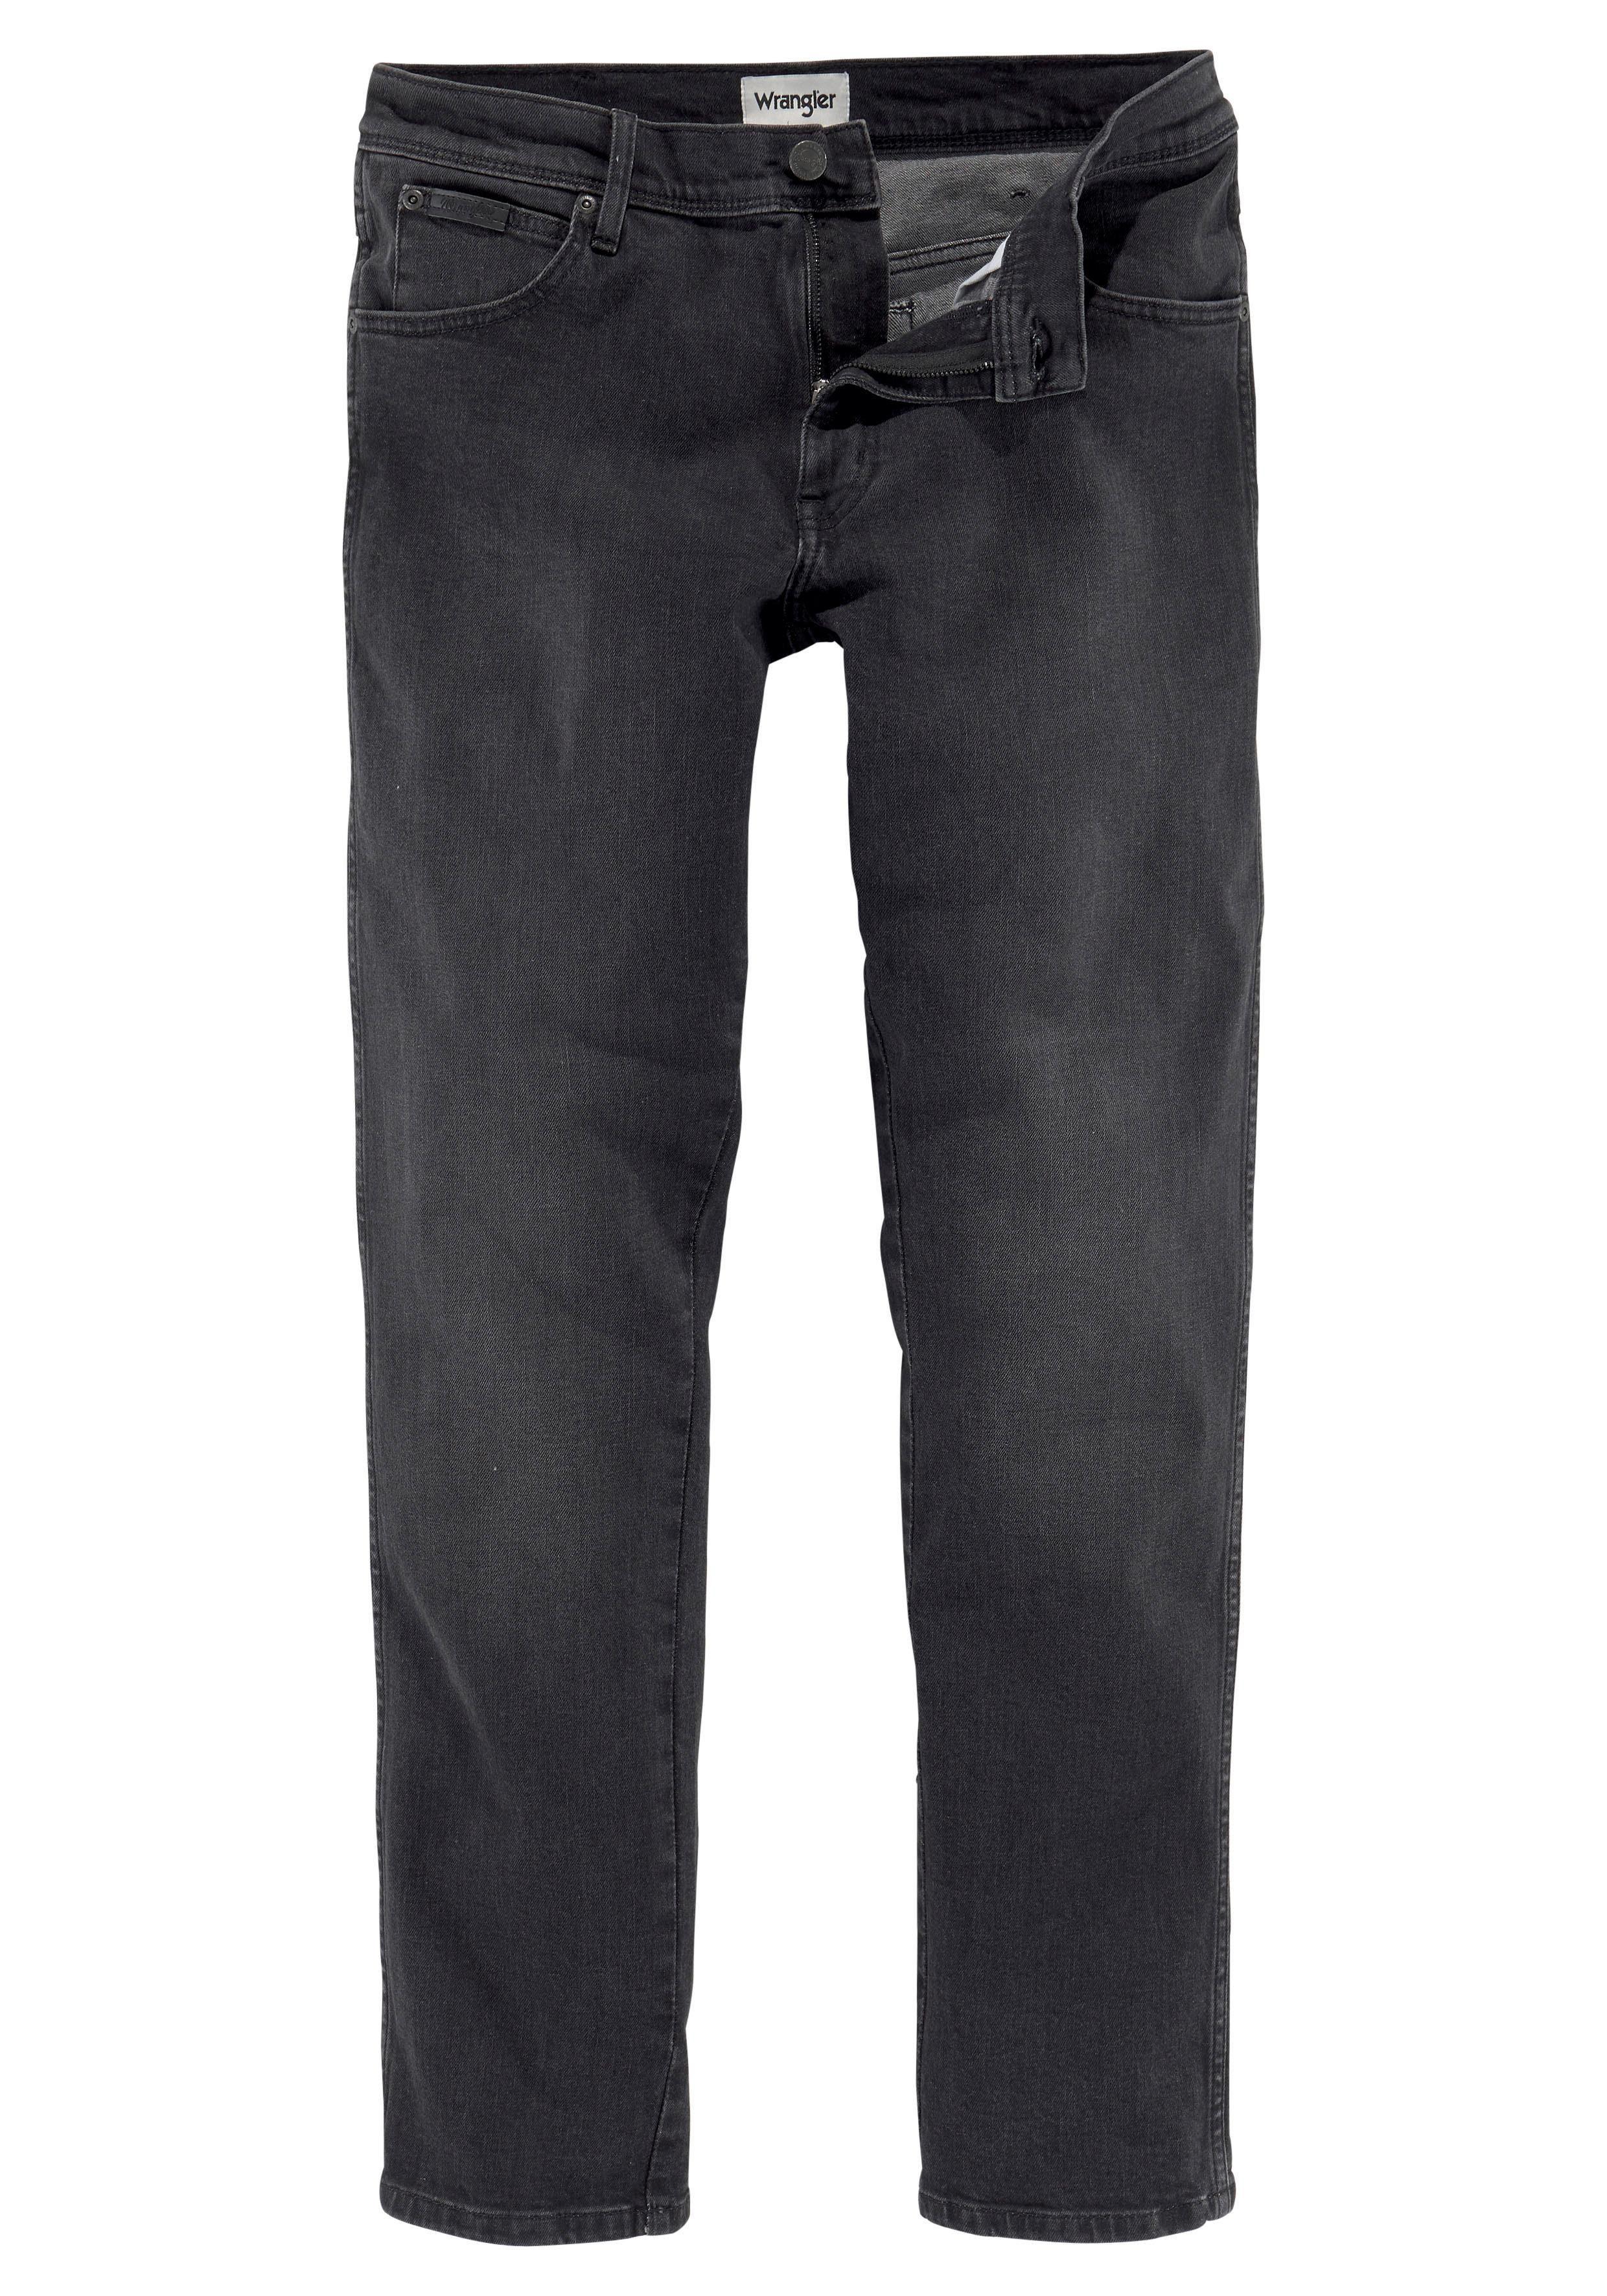 Wrangler Slim-fit-Jeans Texas Slim | Bekleidung > Jeans > Slim Fit Jeans | Wrangler